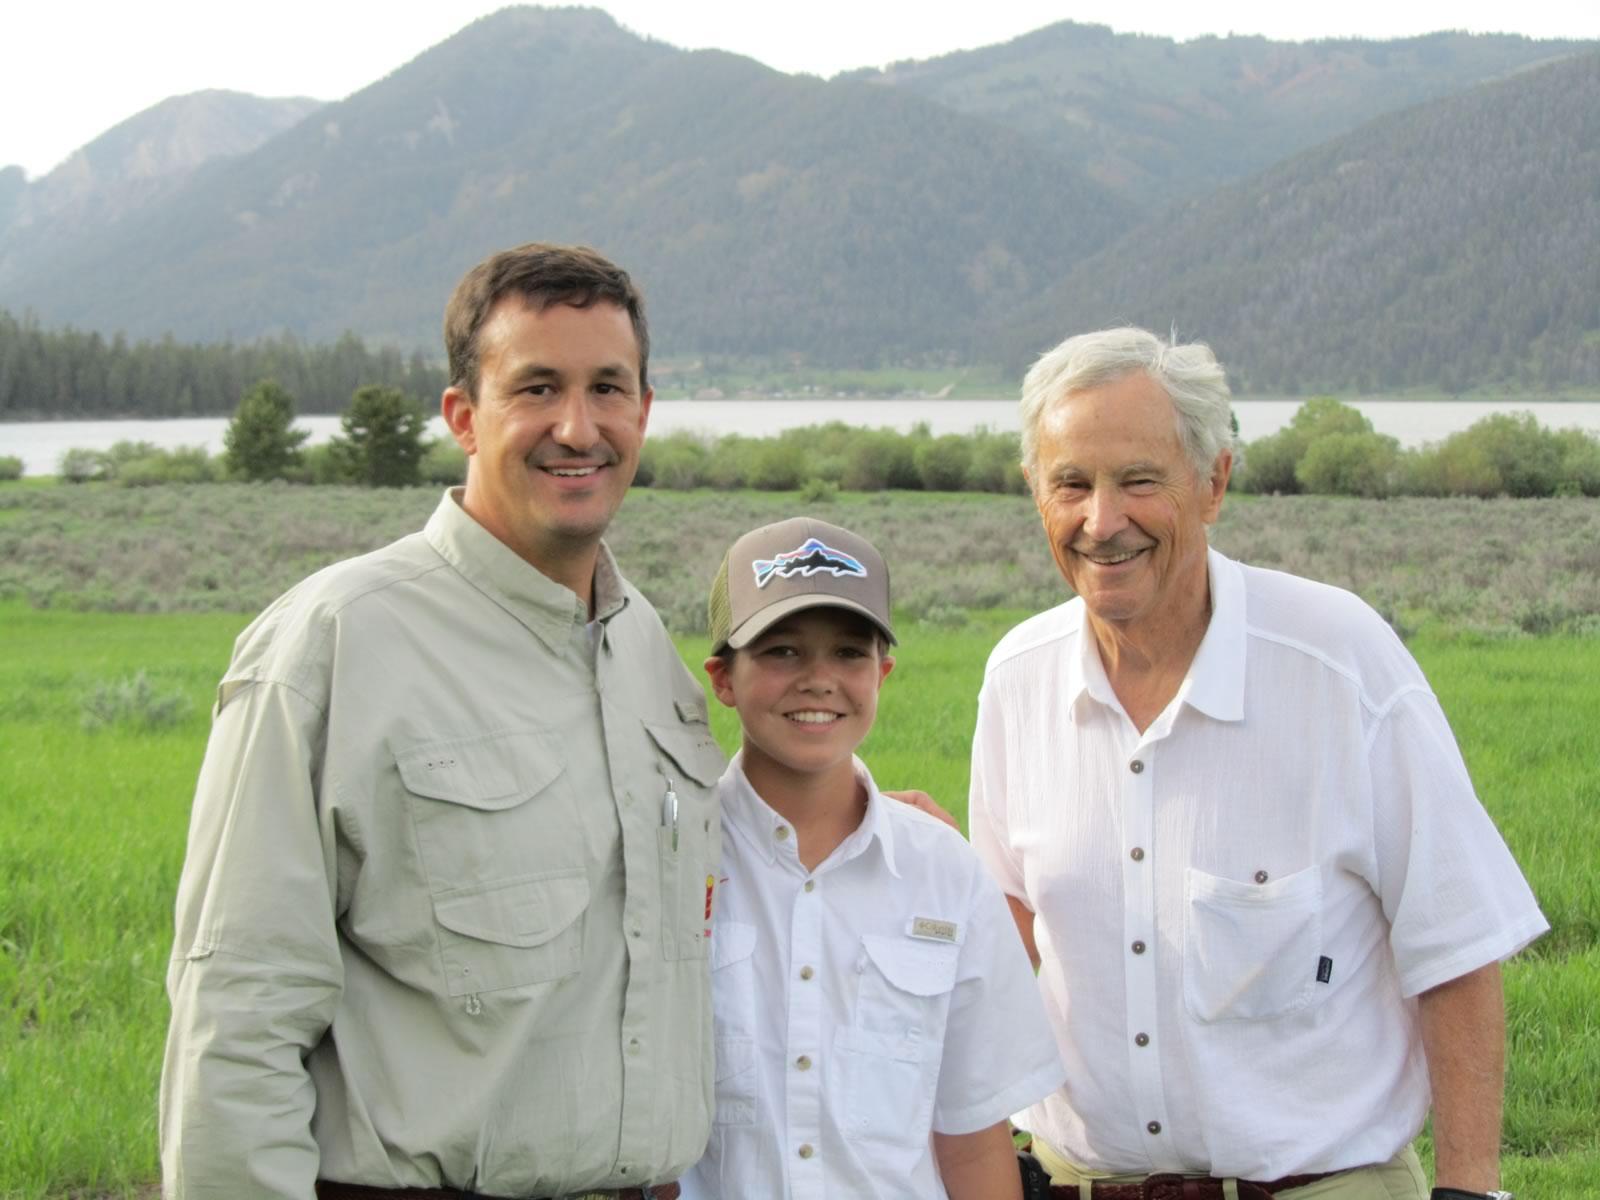 Three generations celebrating a birthday at the Ranch.